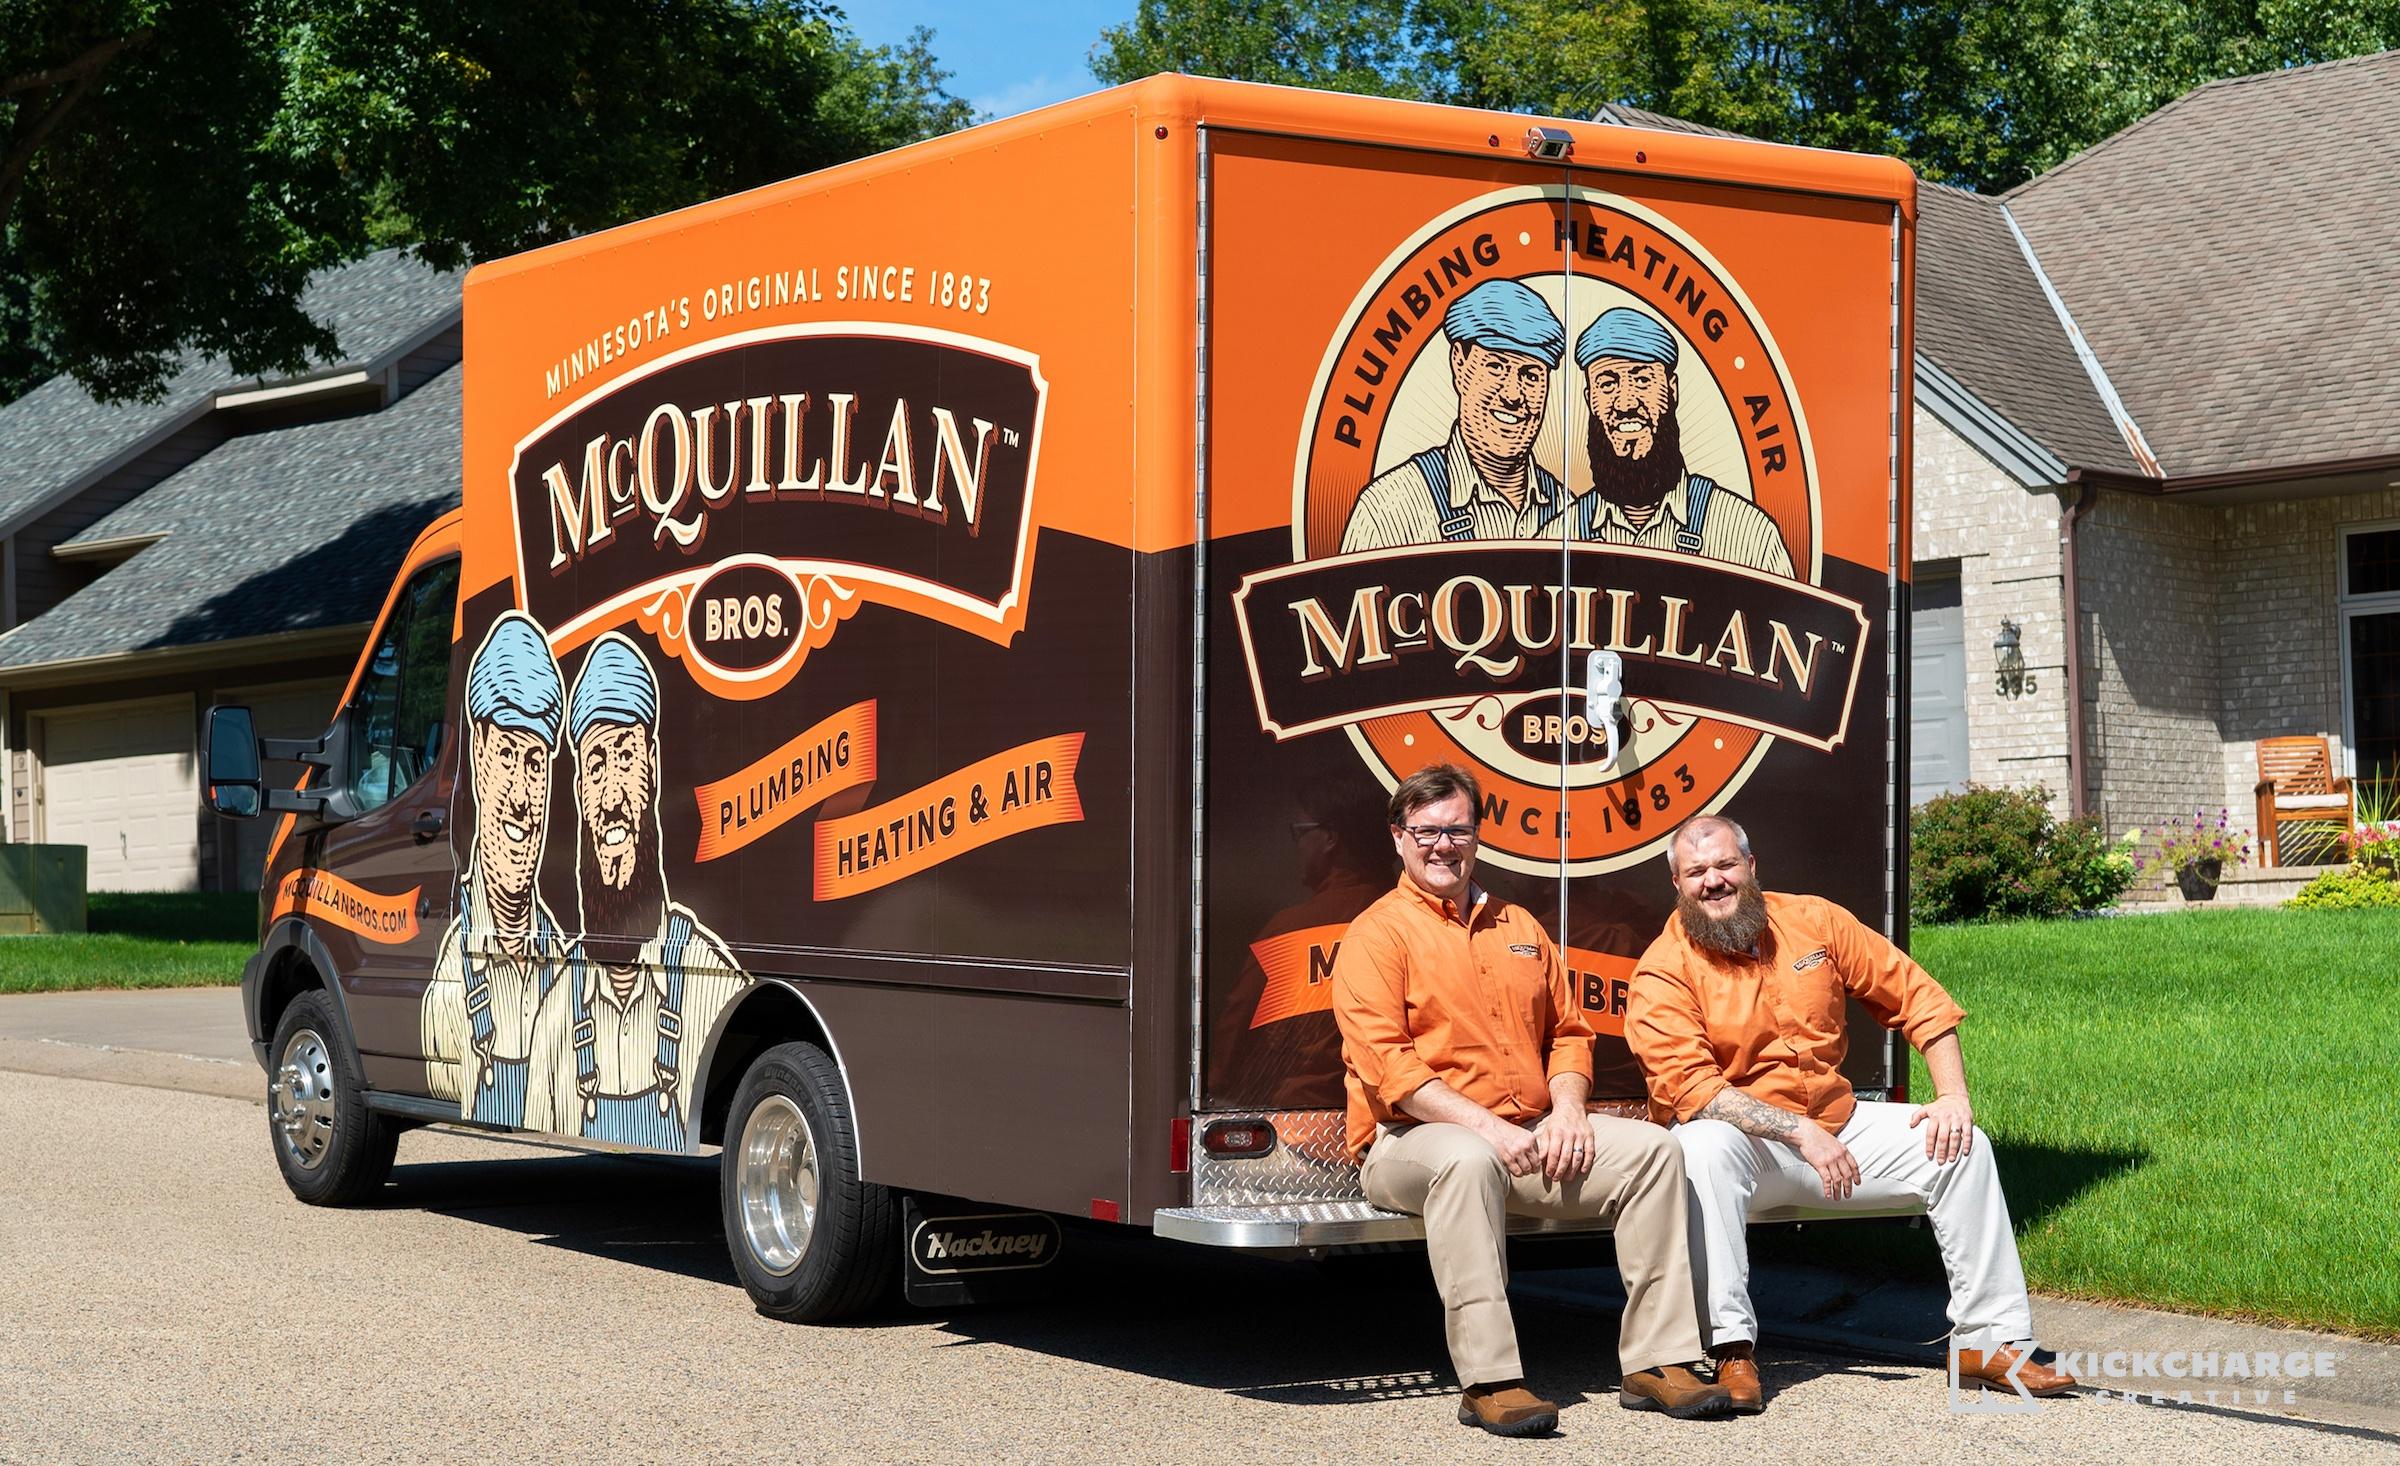 McQuillan Bros